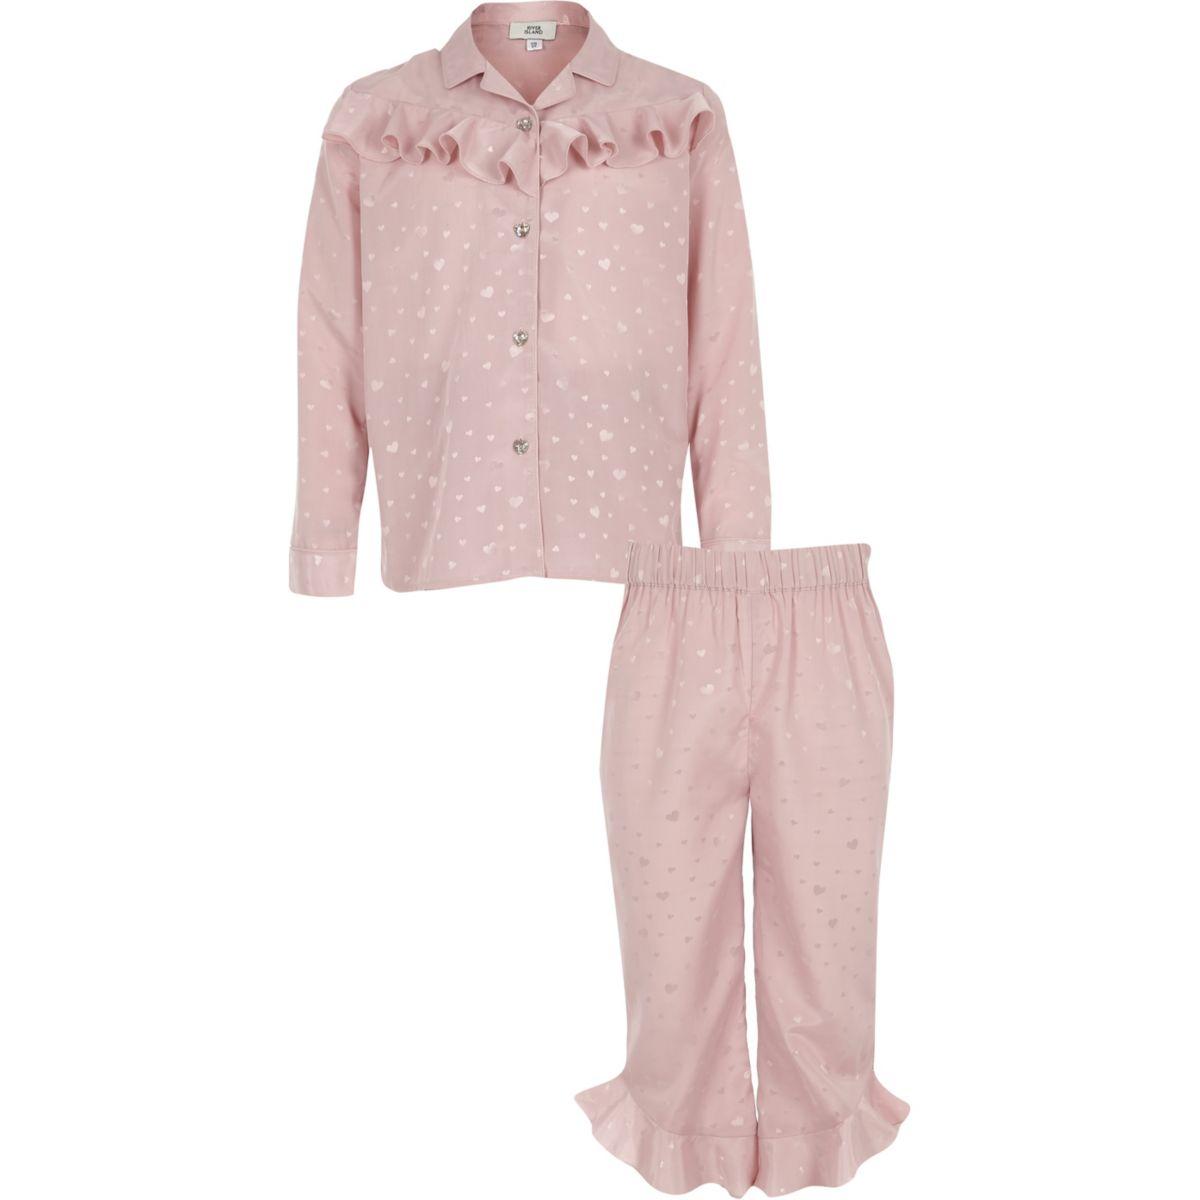 Girls pink heart satin ruffle pyjama set